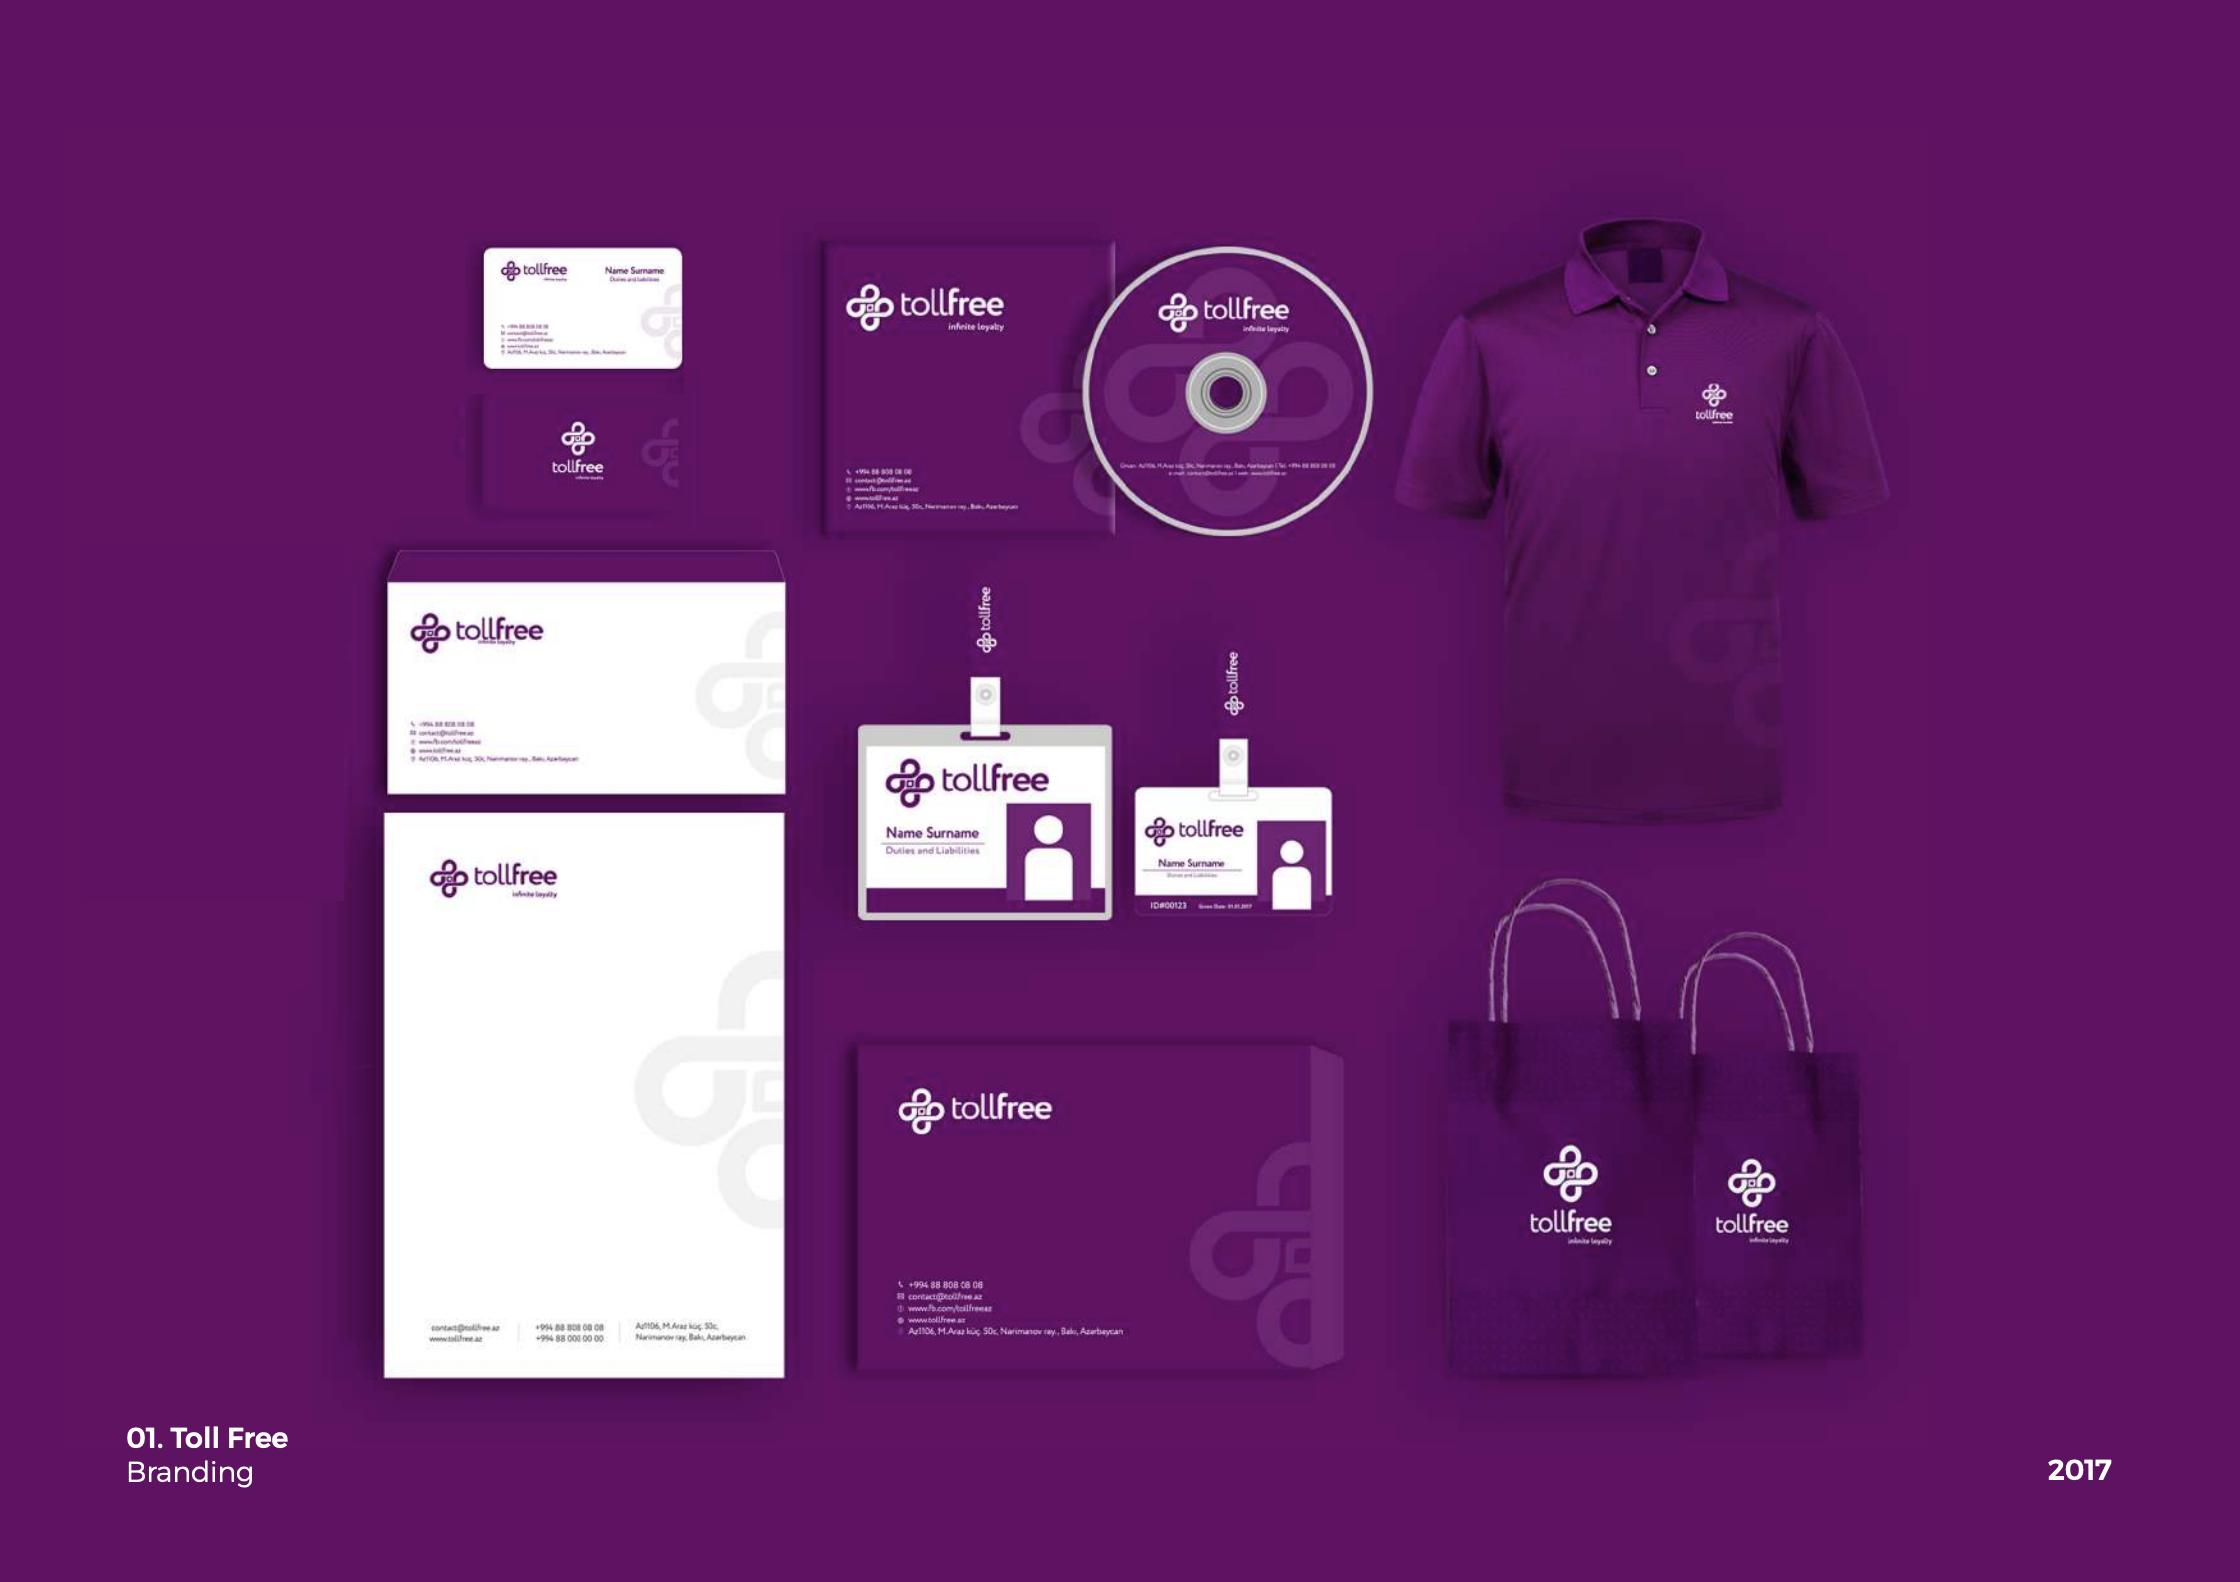 Branding image - 2